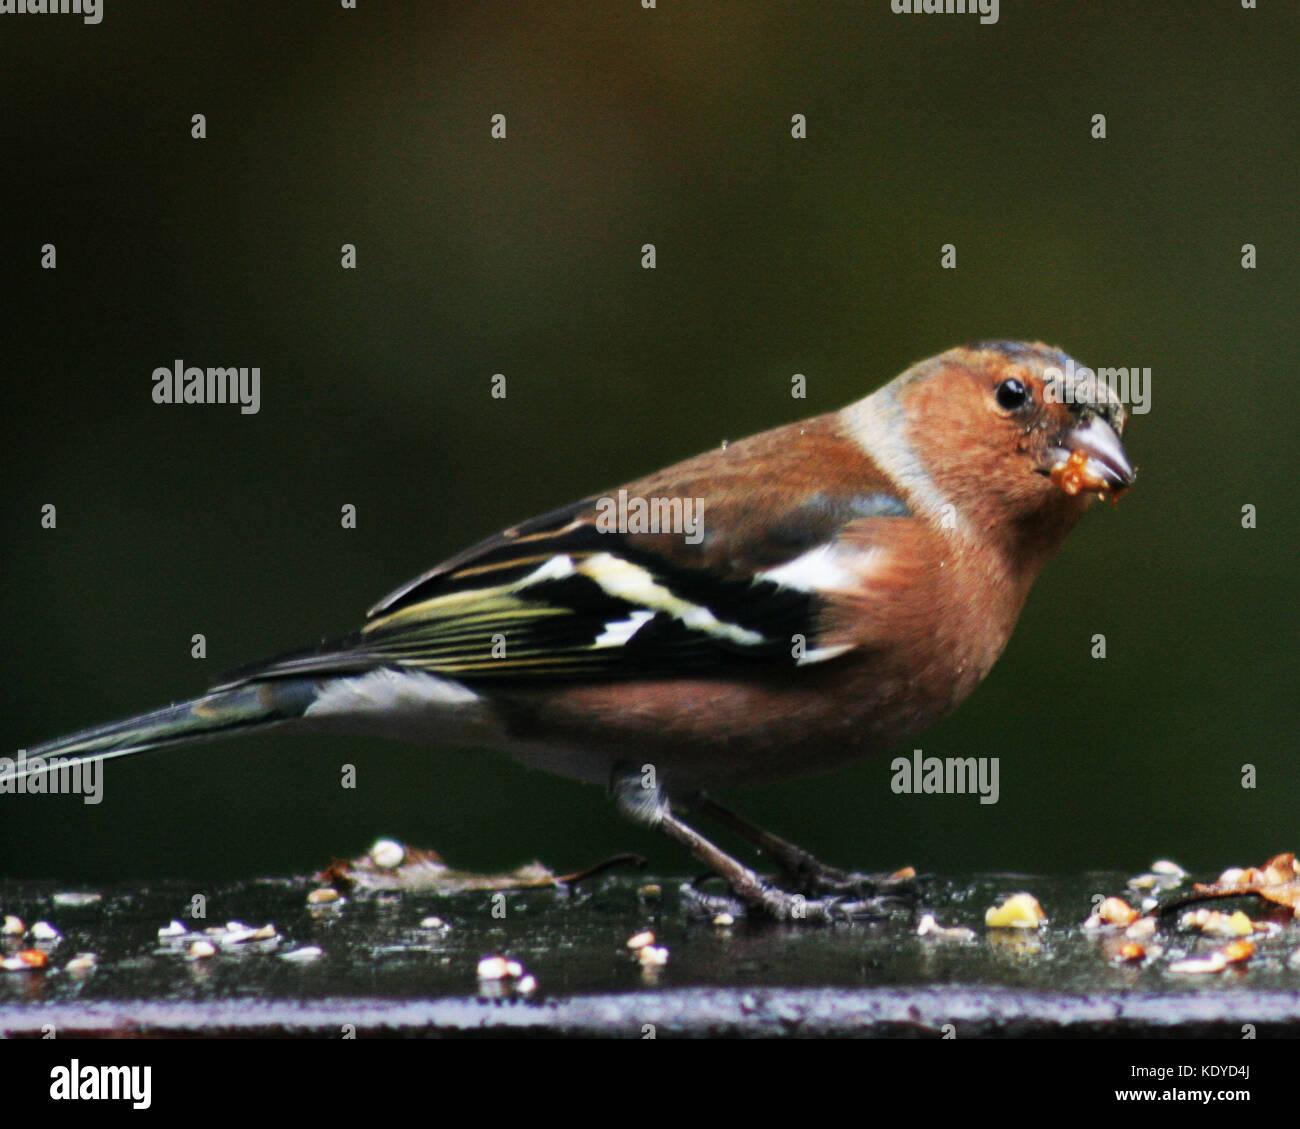 Chaffinch Feeding - Stock Image